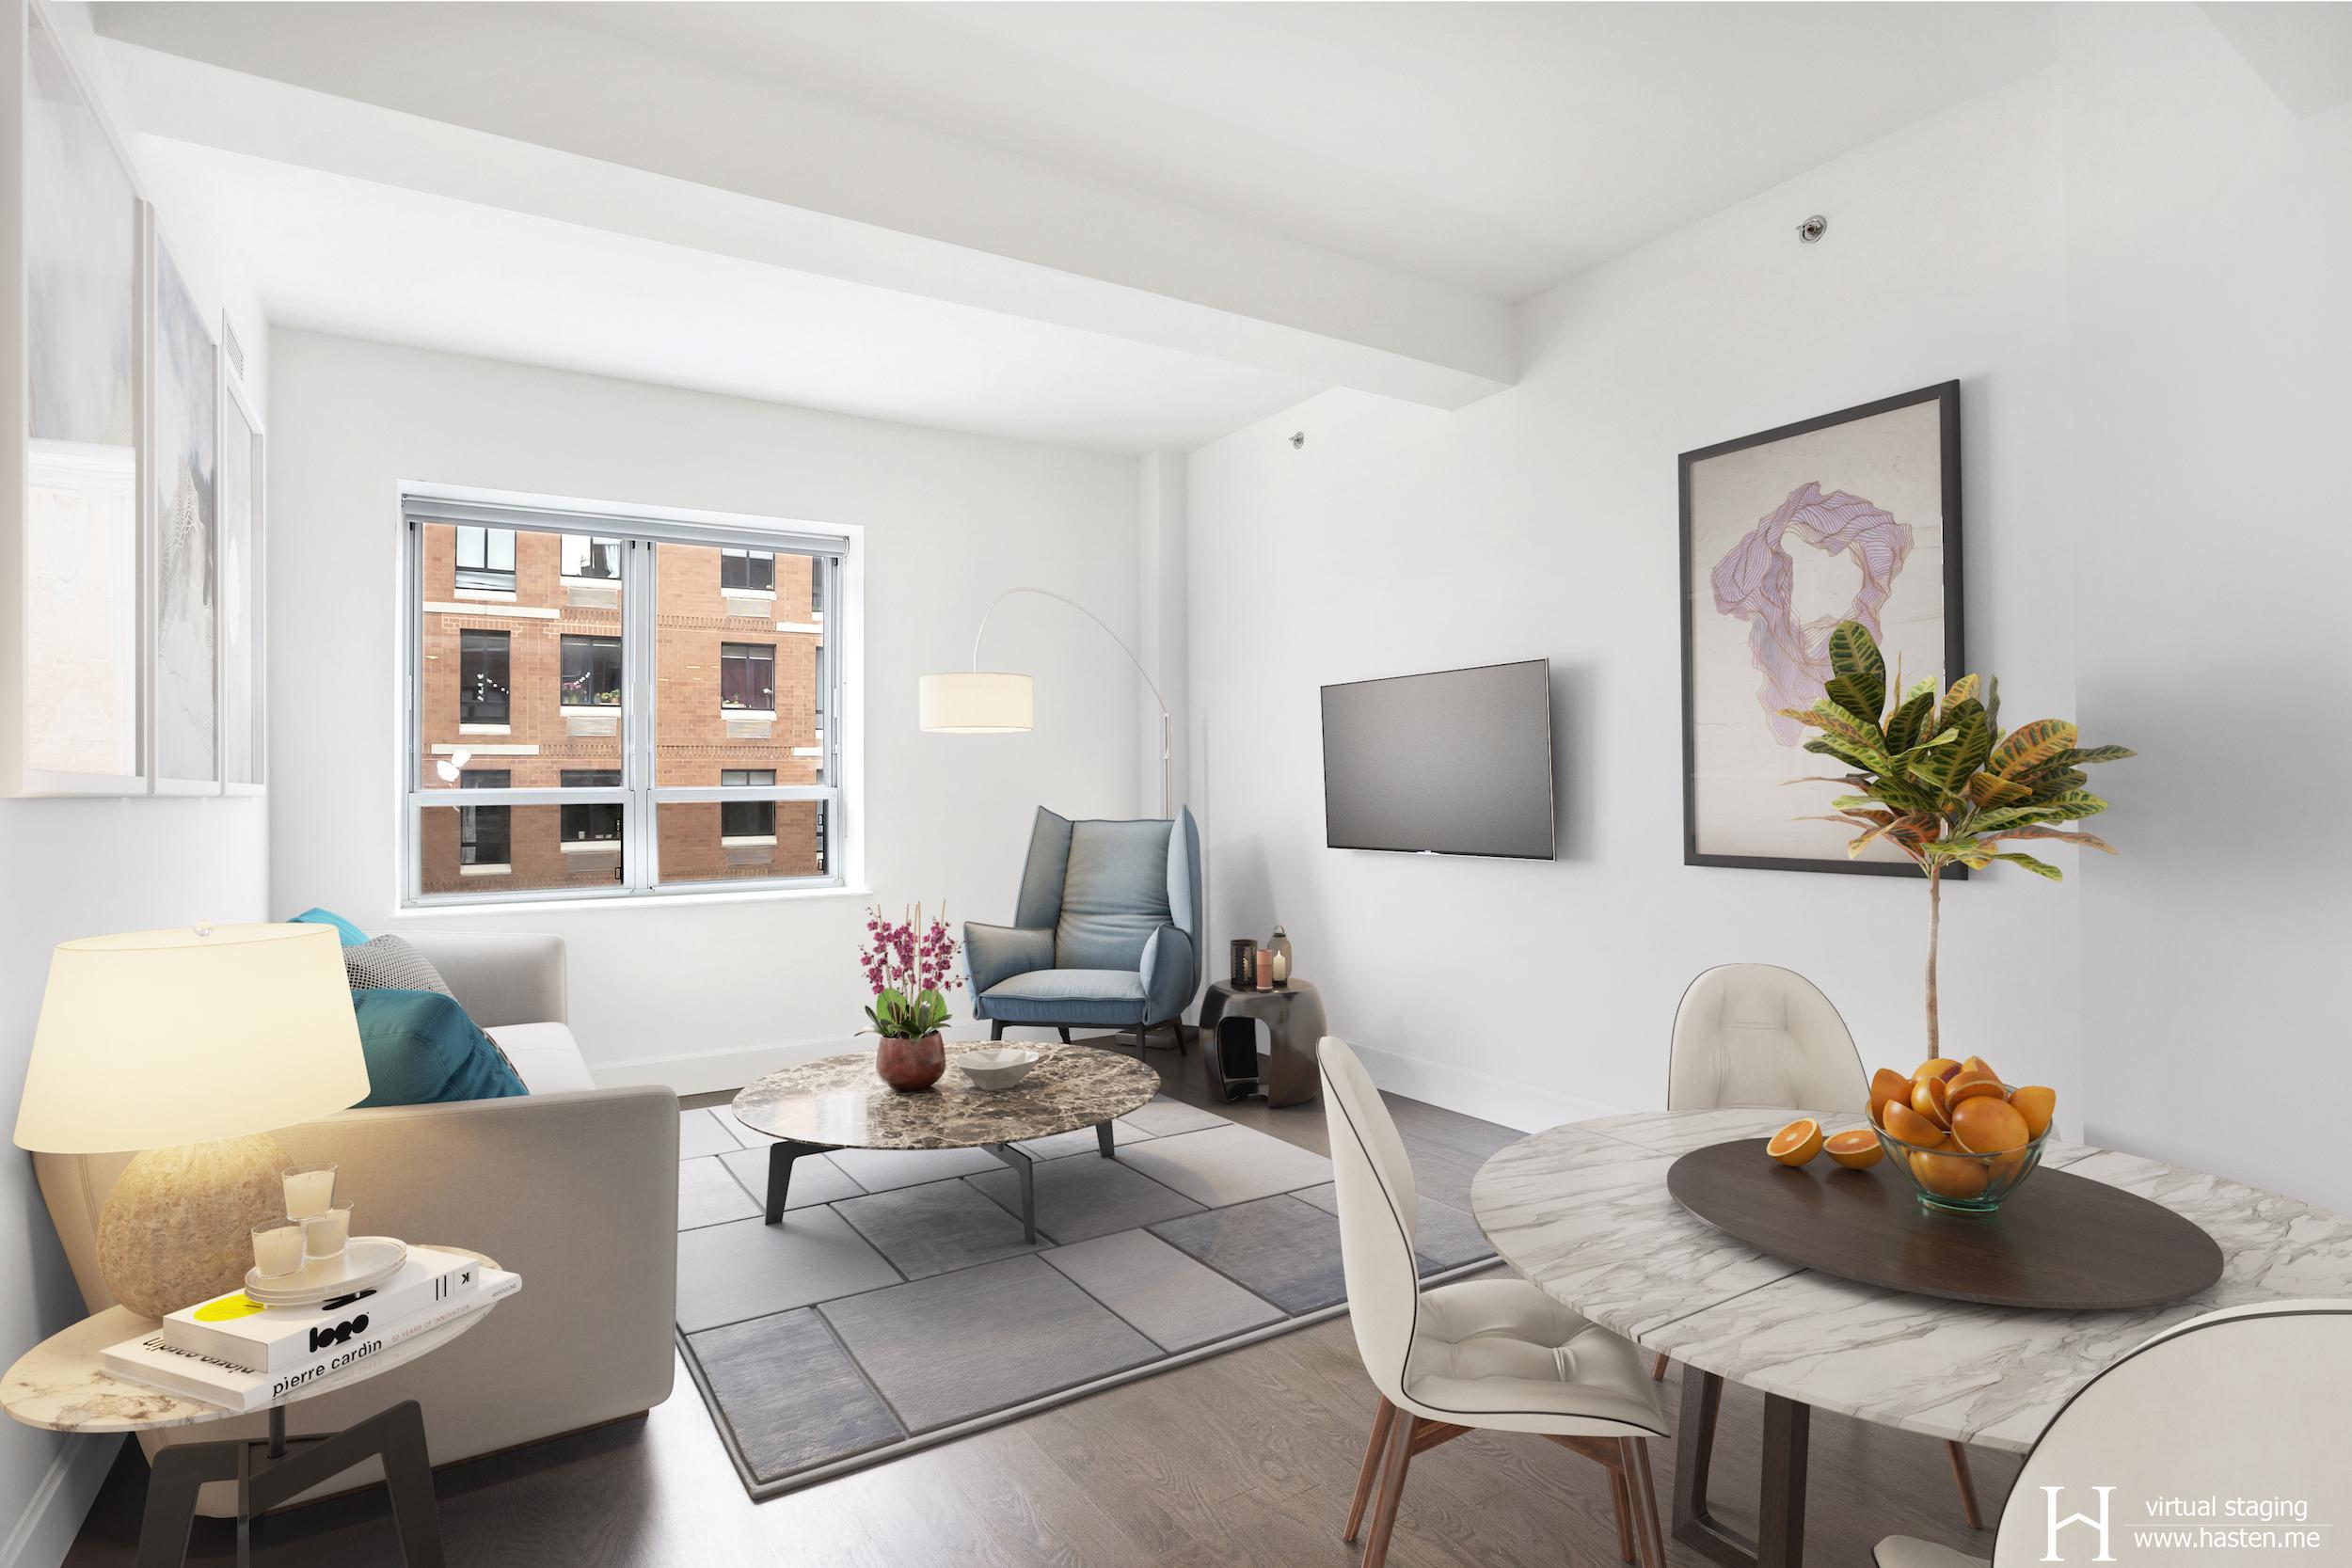 432 West 52nd Street, #2F - $950,000